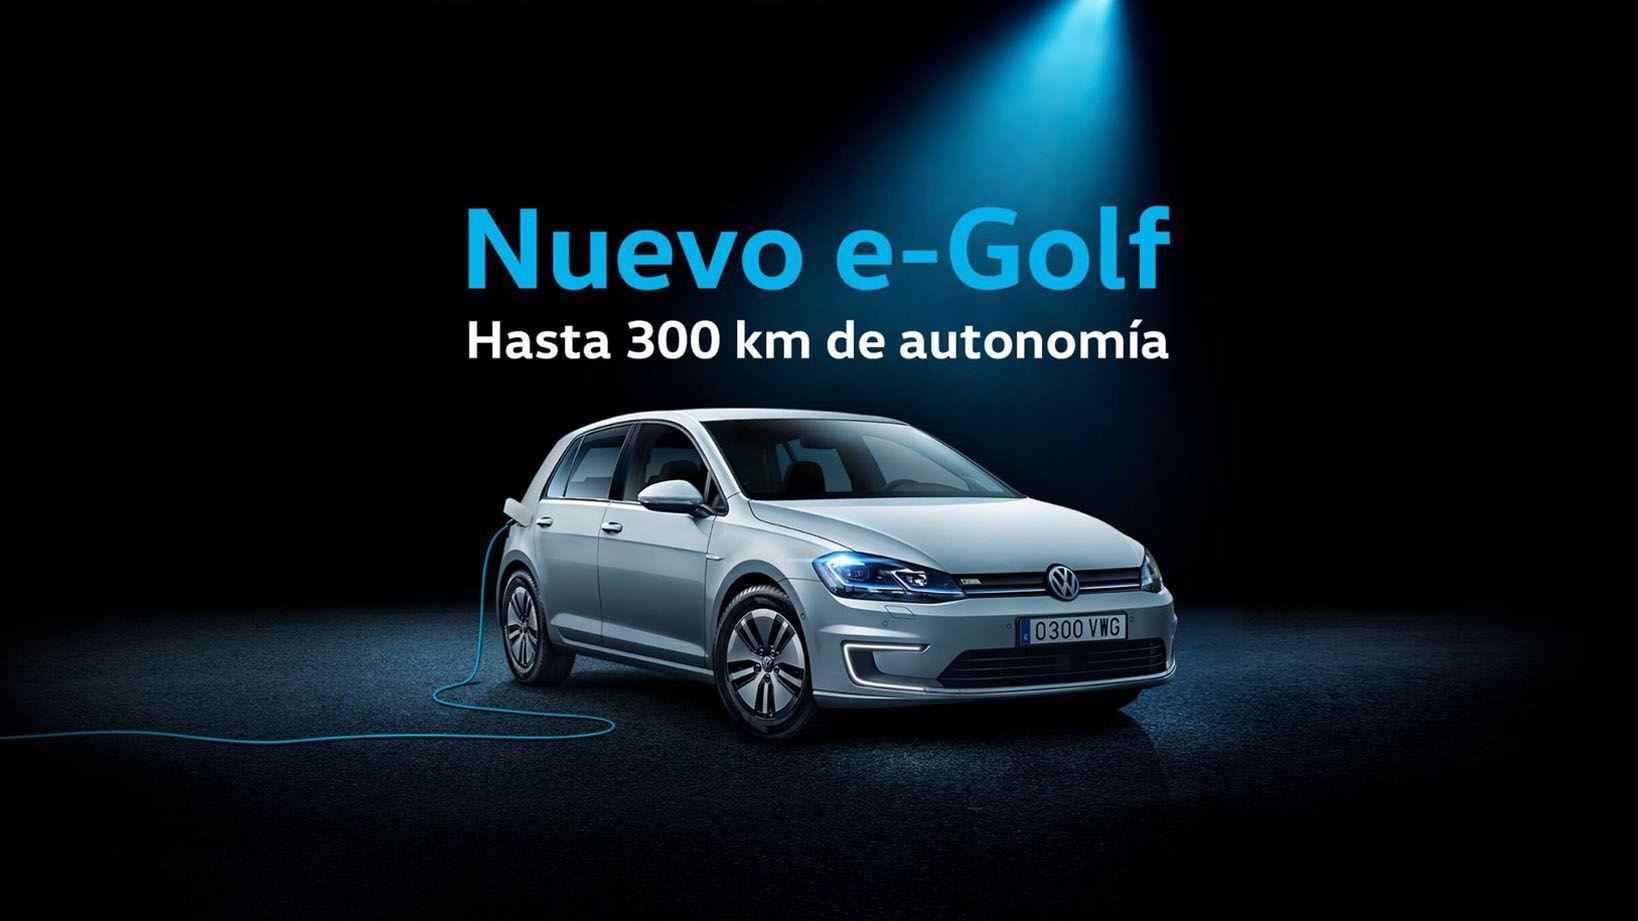 nou e-Golf